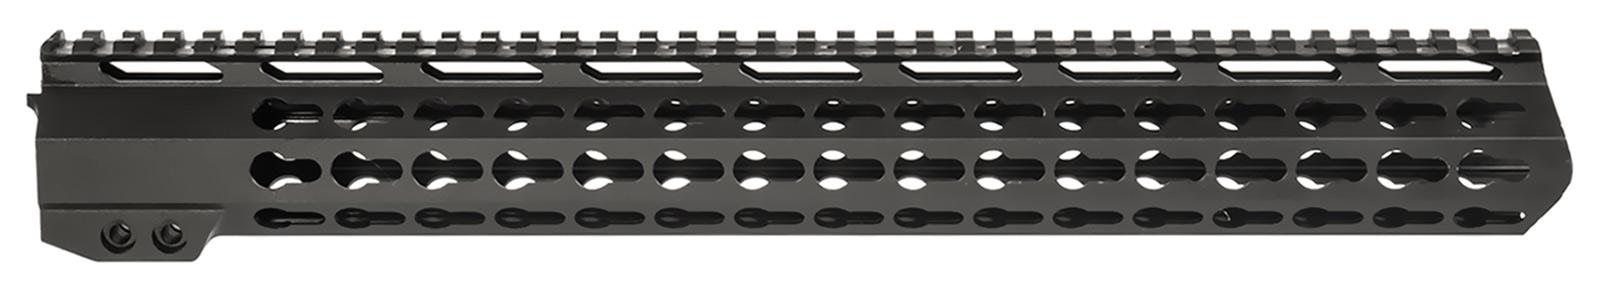 ar15-rail-15-inch-generation-2-keymod-handguard-rail-120009